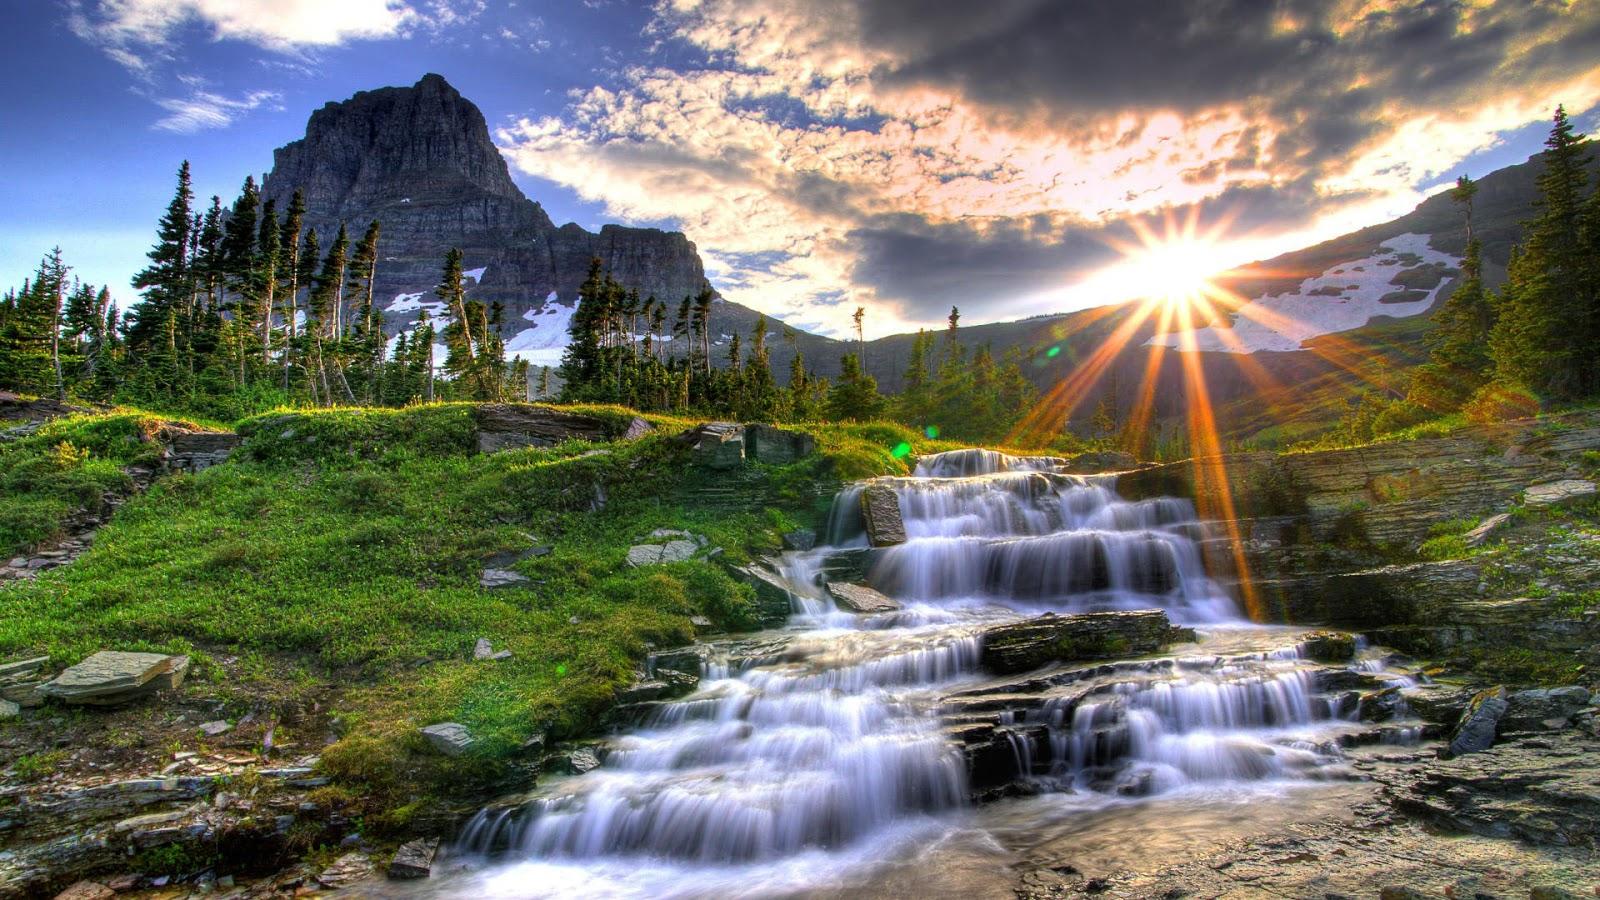 Best   Wallpaper Home Screen Water - Waterfalls-HD-Wallpapers-Free-Download-20141020  Graphic_89766.jpg